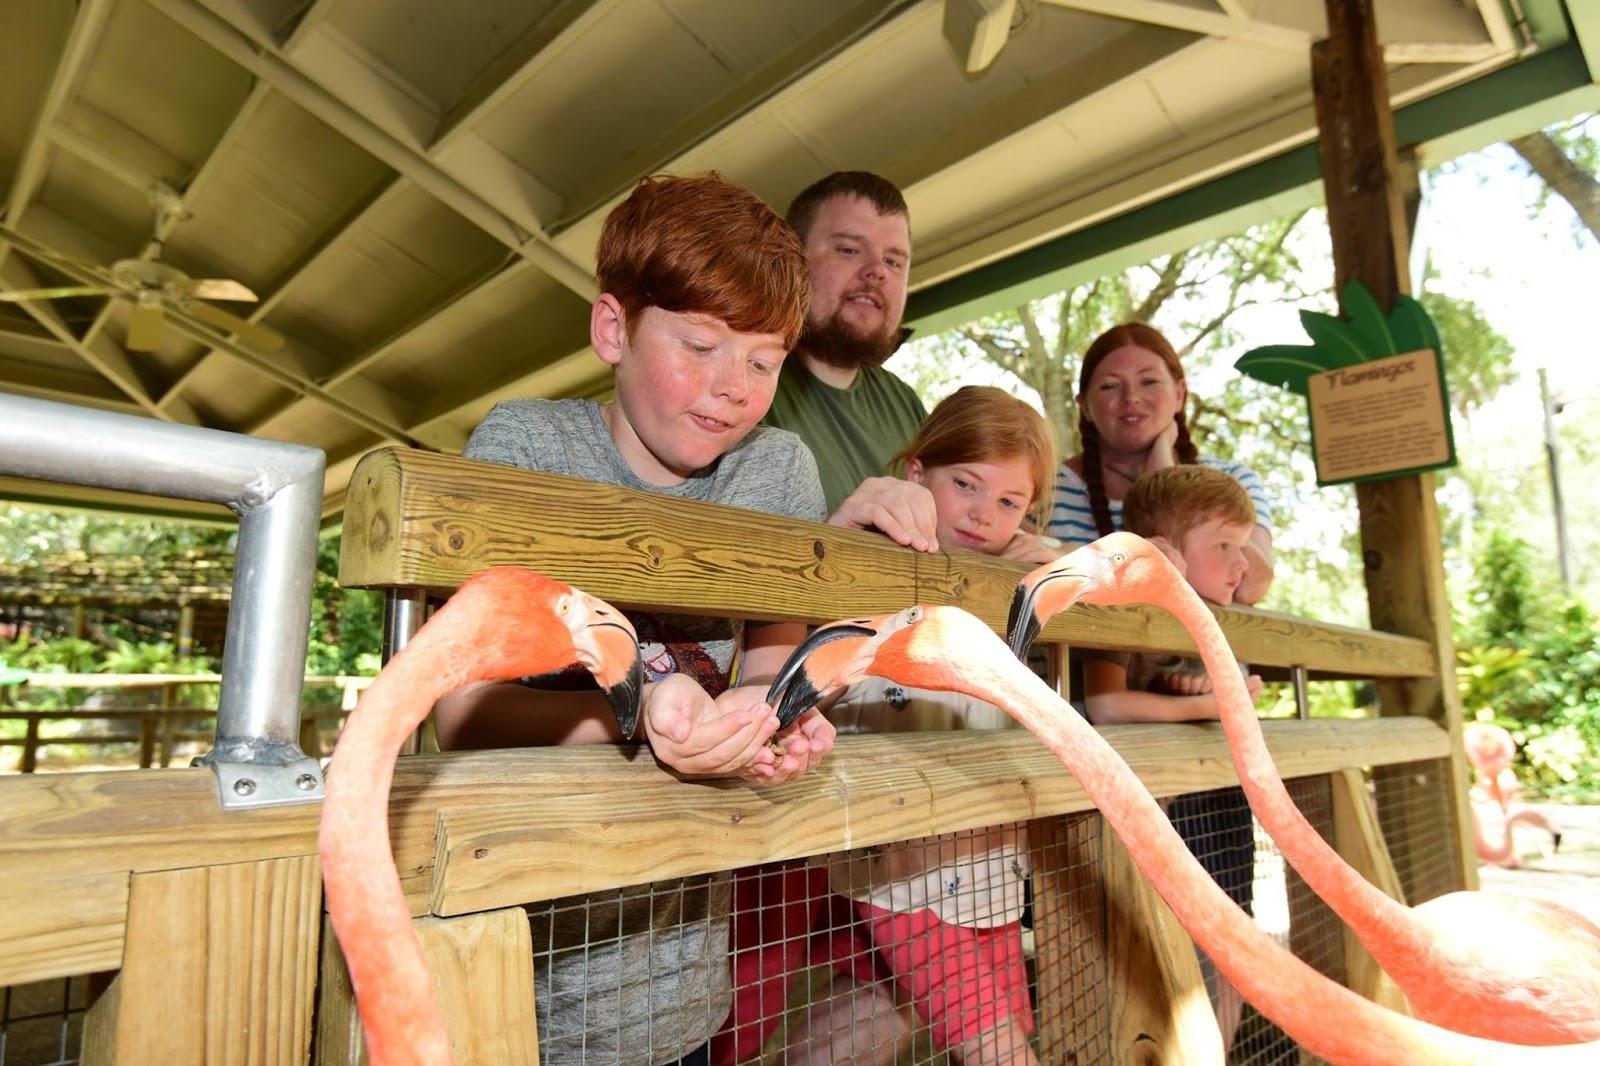 Holiday Memories : Making Pretzels at Home  - flamingos at busch gardens